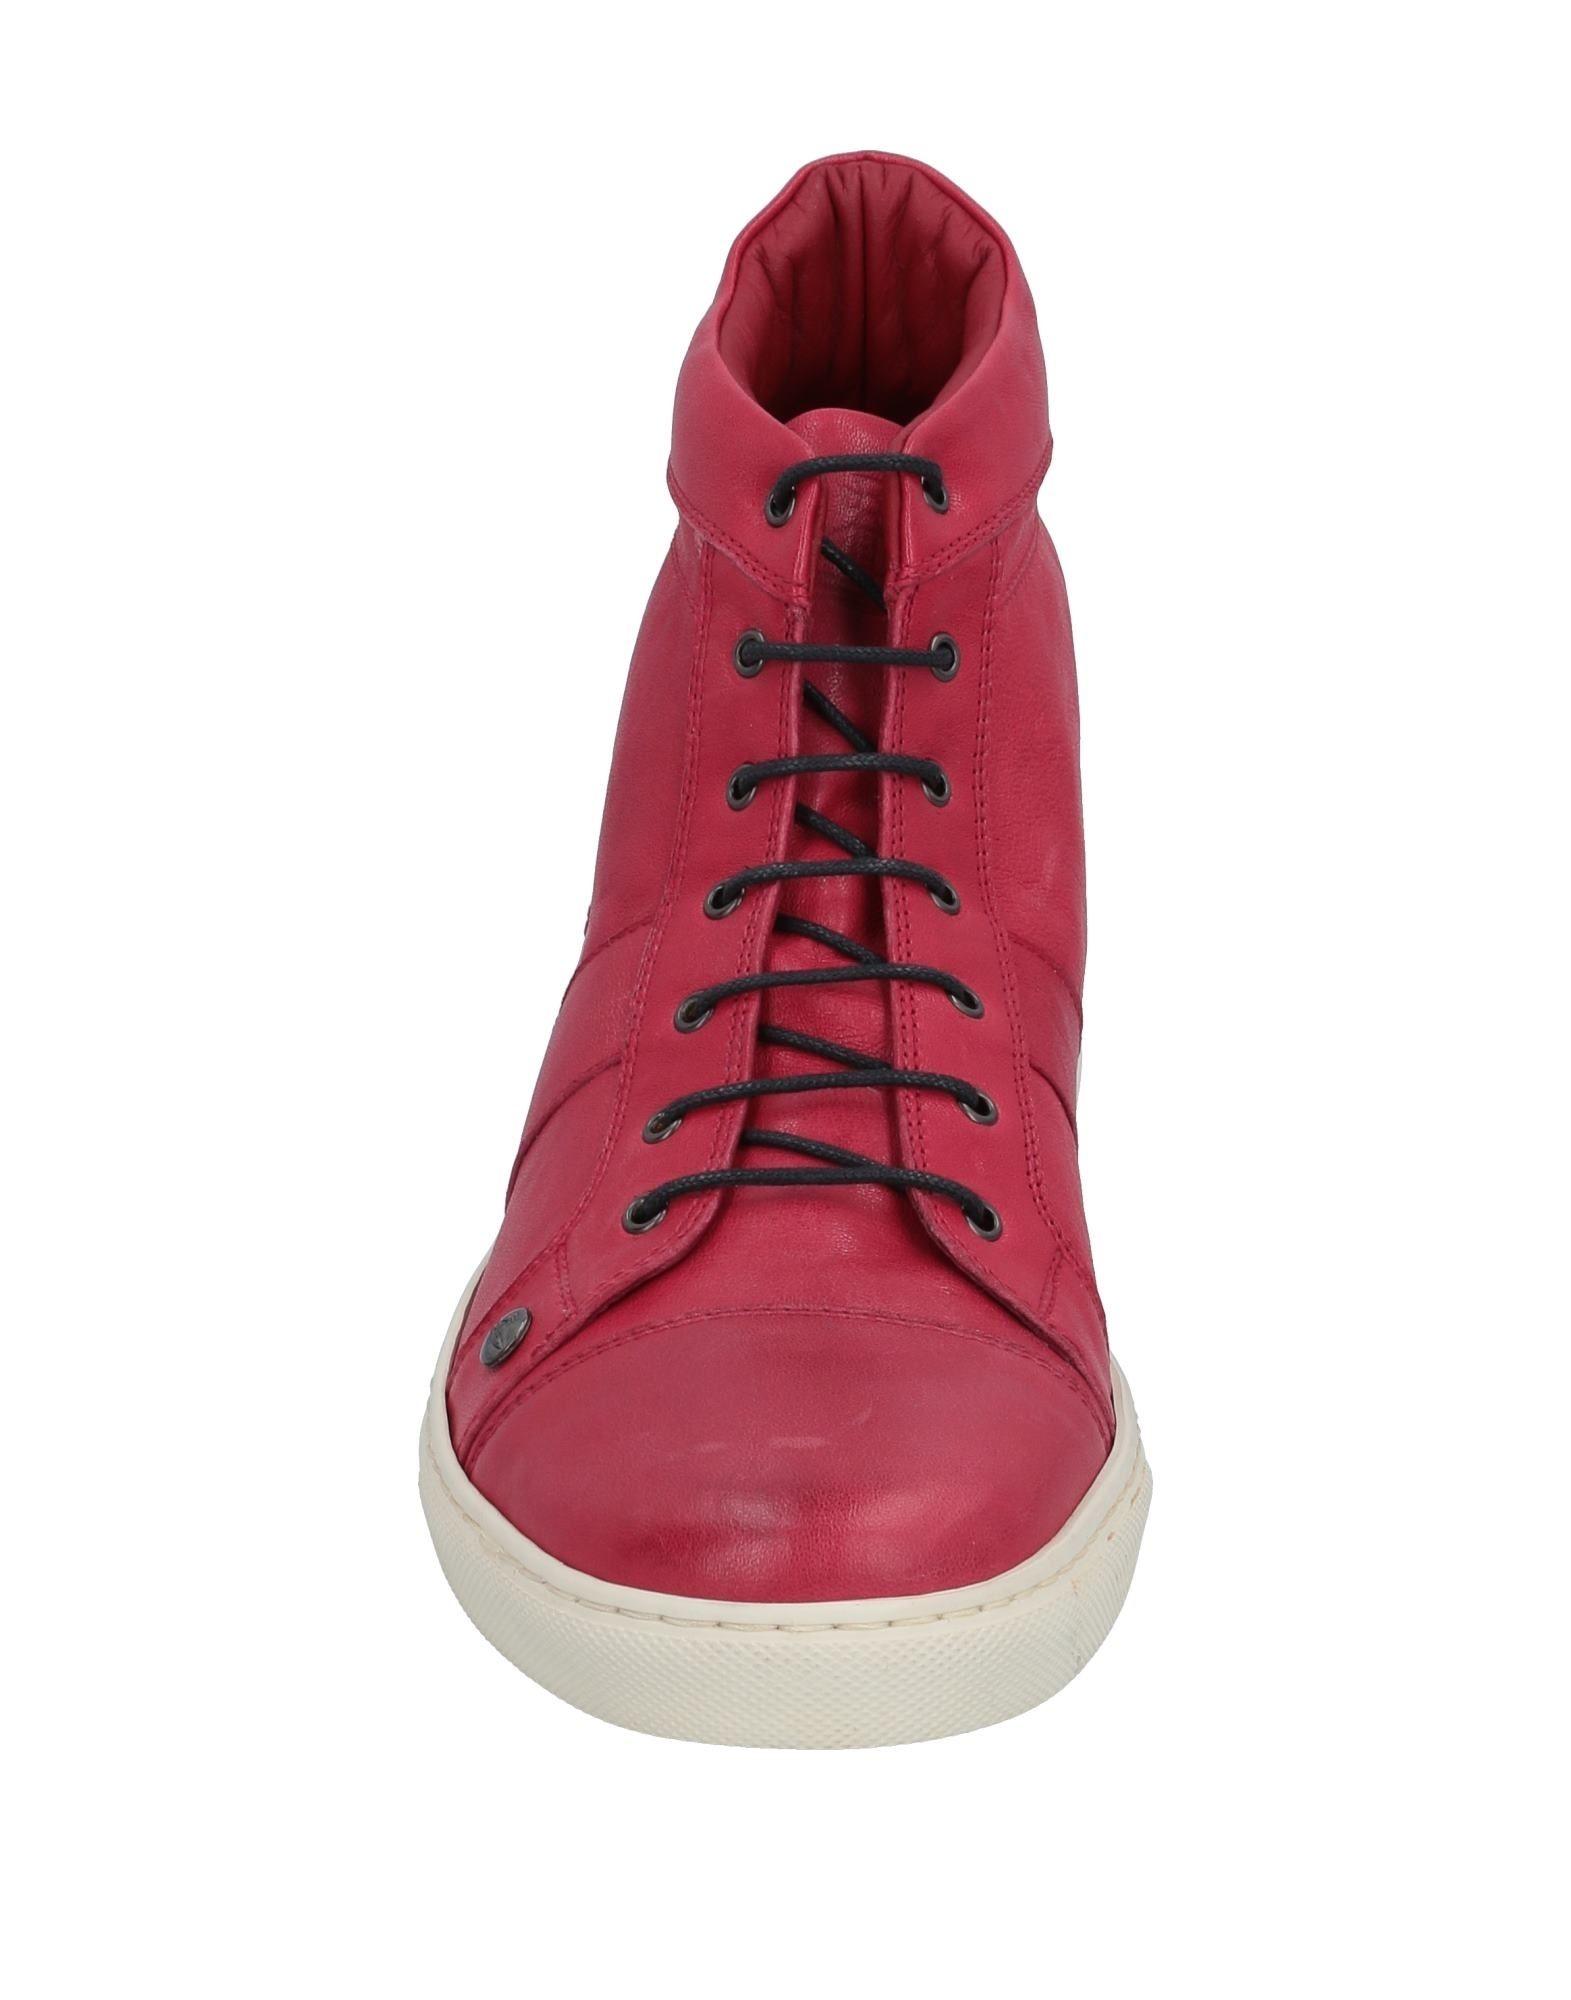 Vivienne Vivienne Vivienne Westwood Sneakers Herren Gutes Preis-Leistungs-Verhältnis, es lohnt sich 0c2ba9